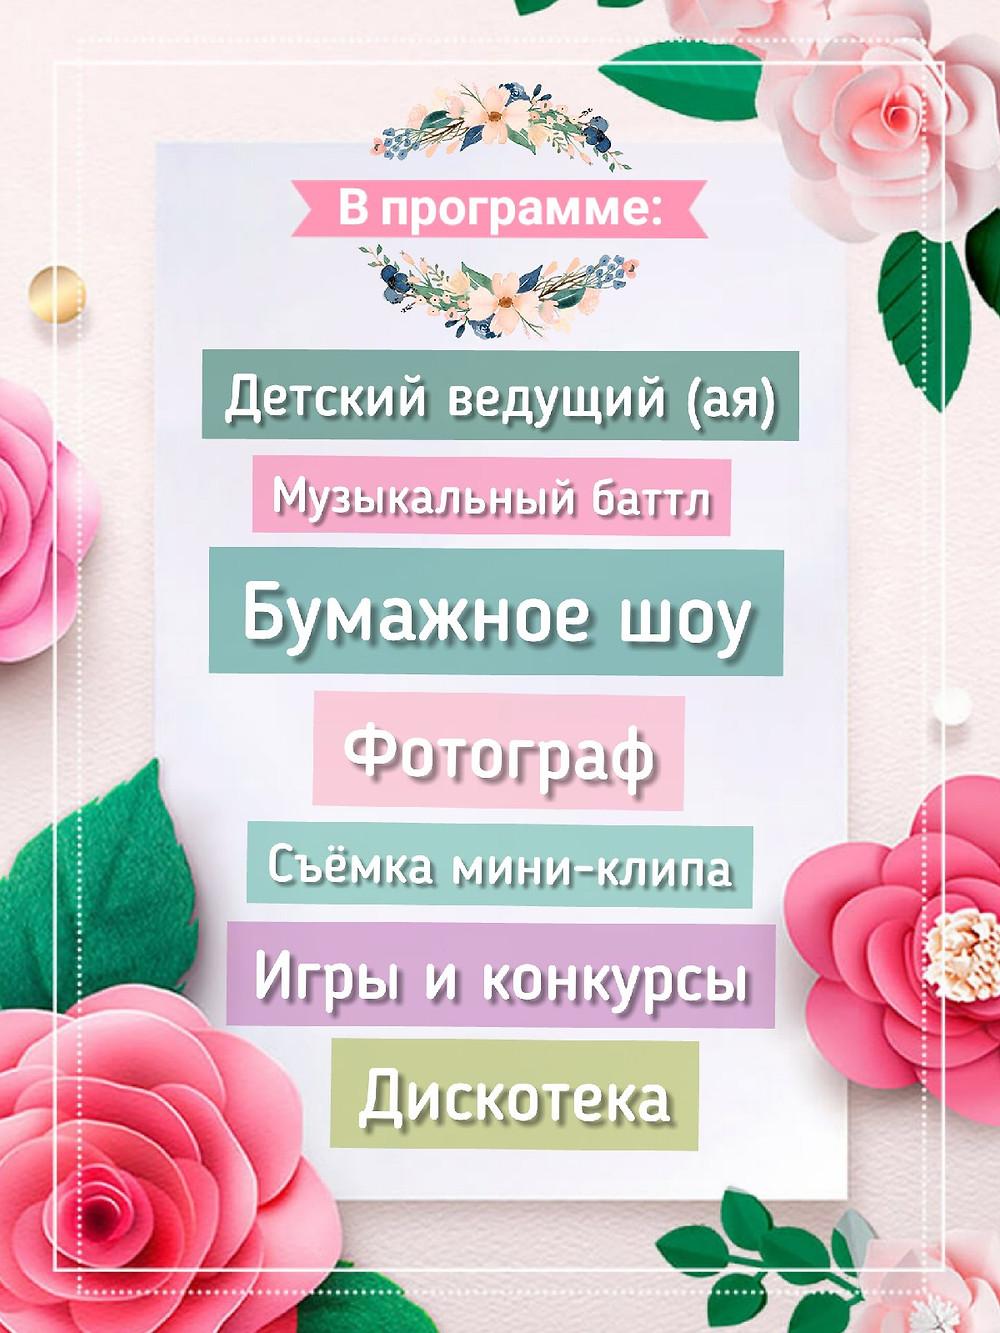 Акция месяца Февраль